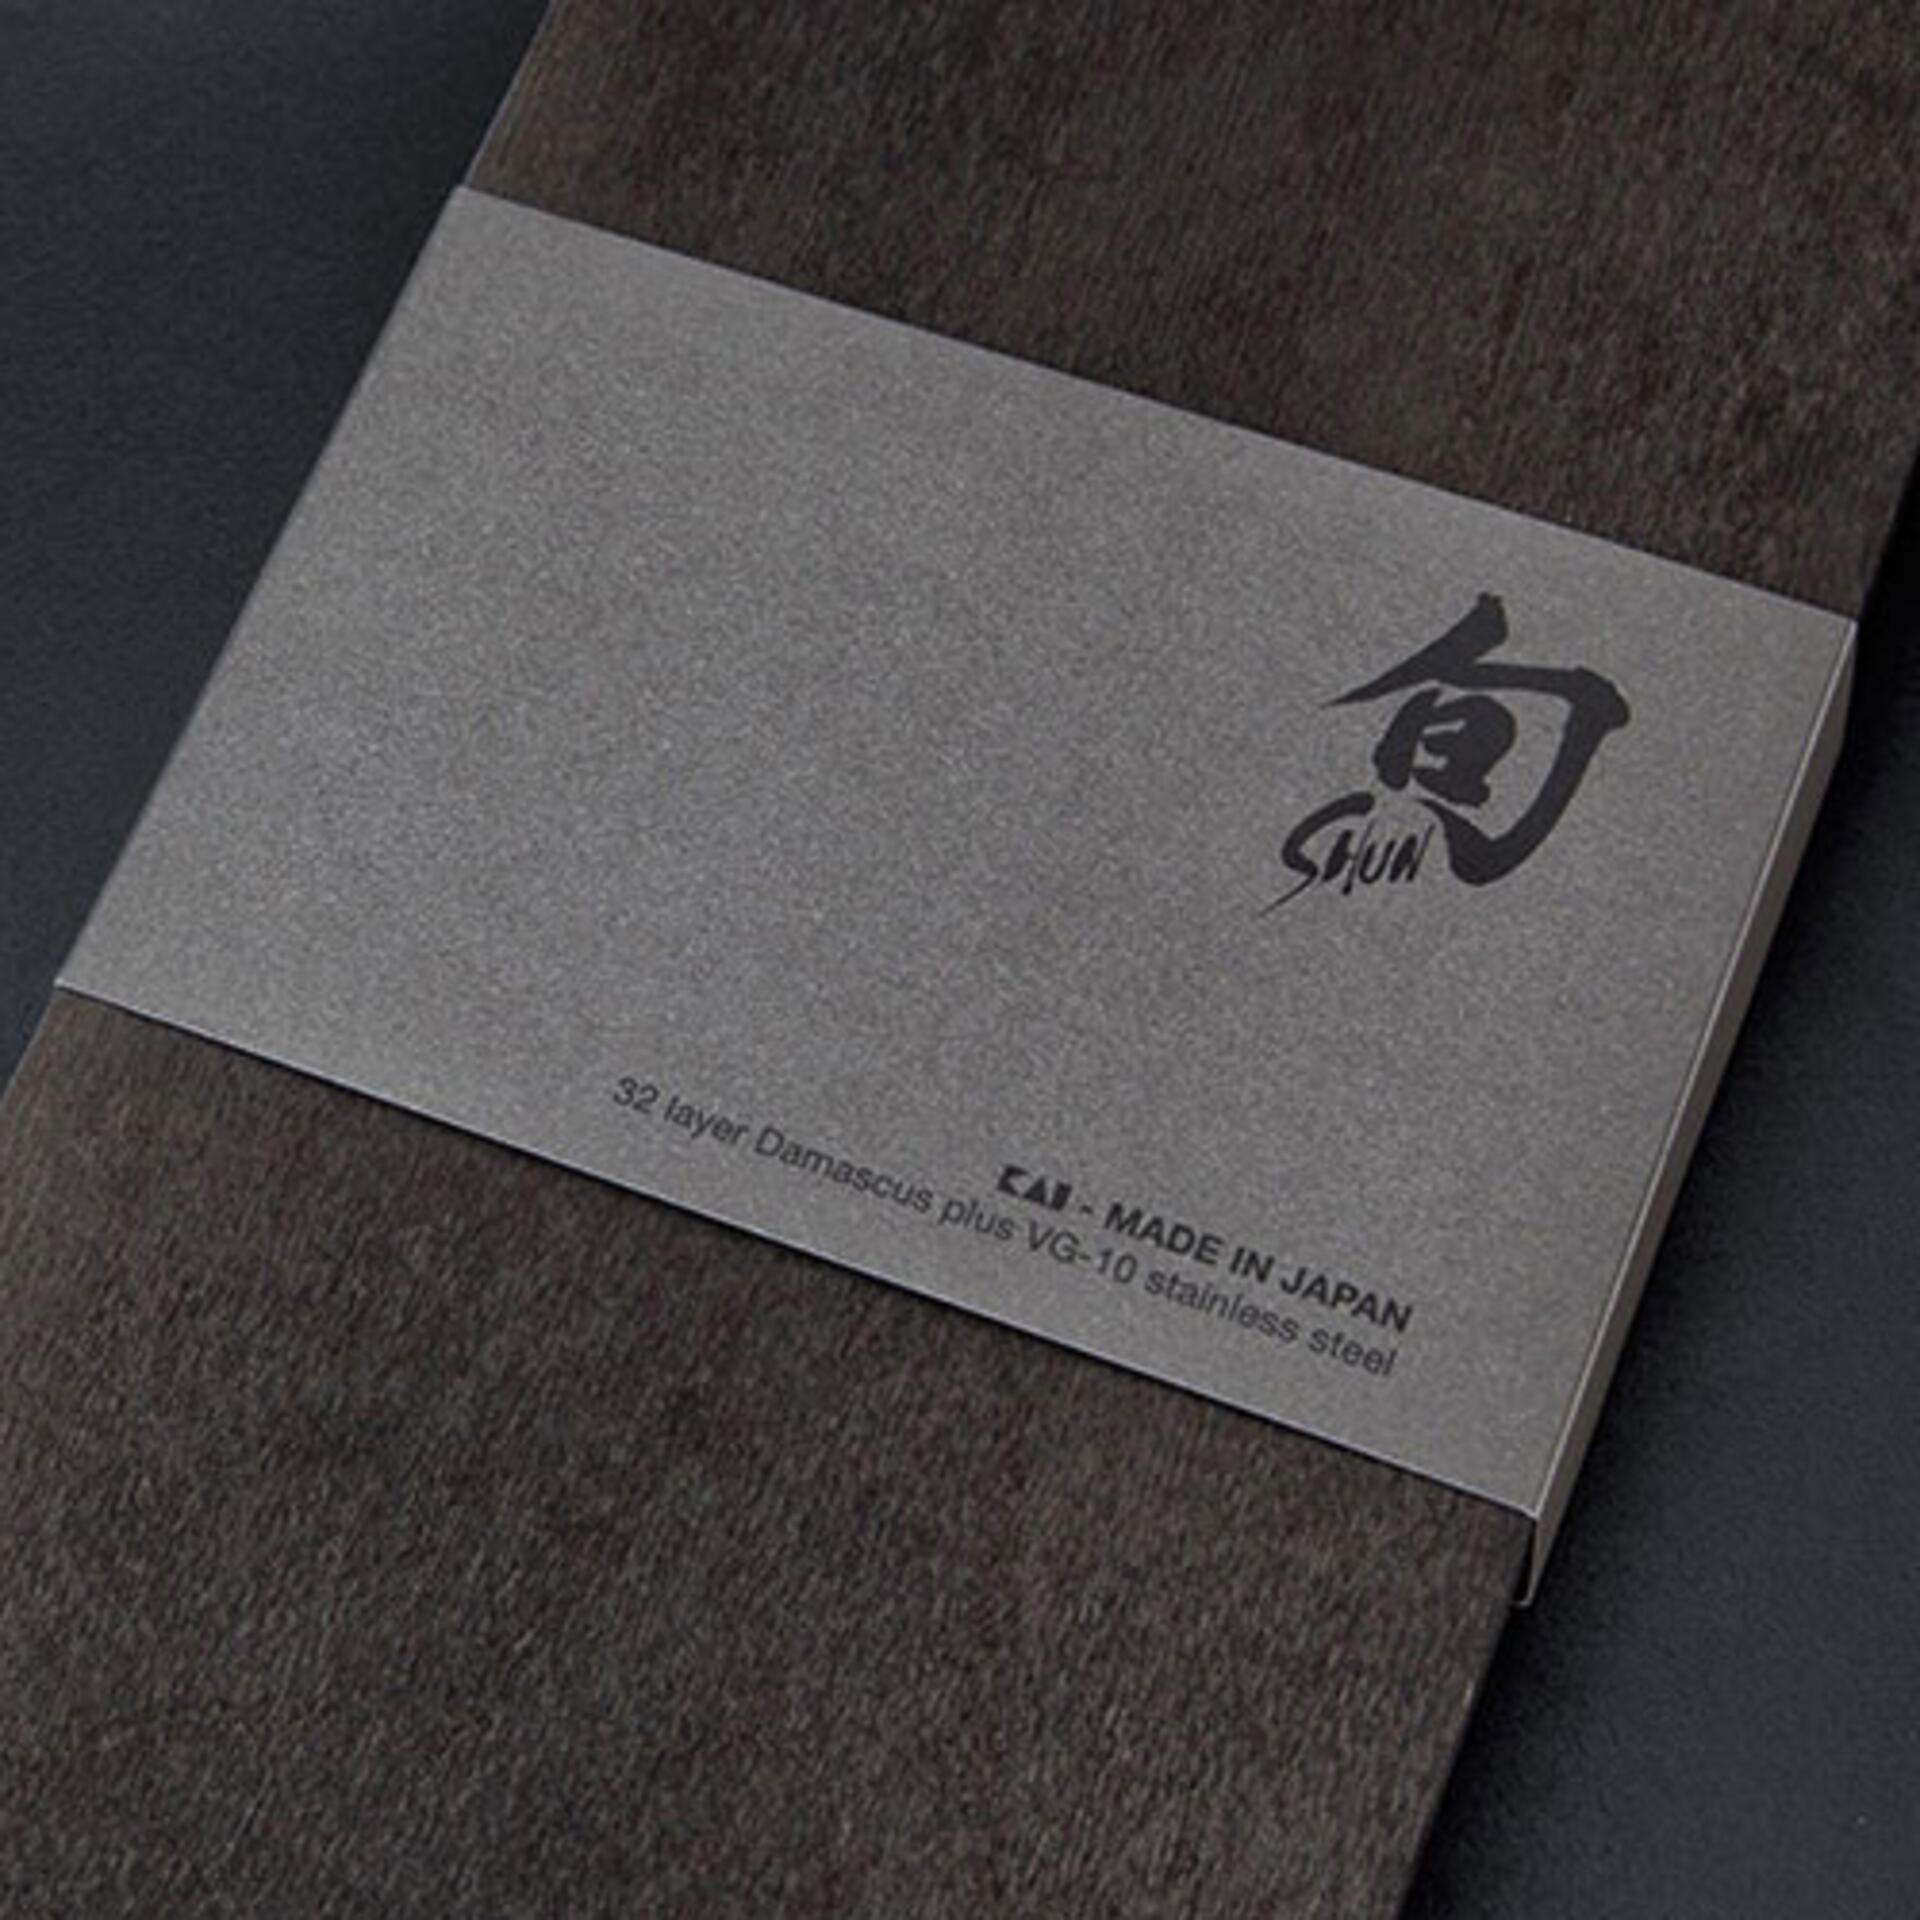 KAI Shun Classic Schinkenmesser DM-0704